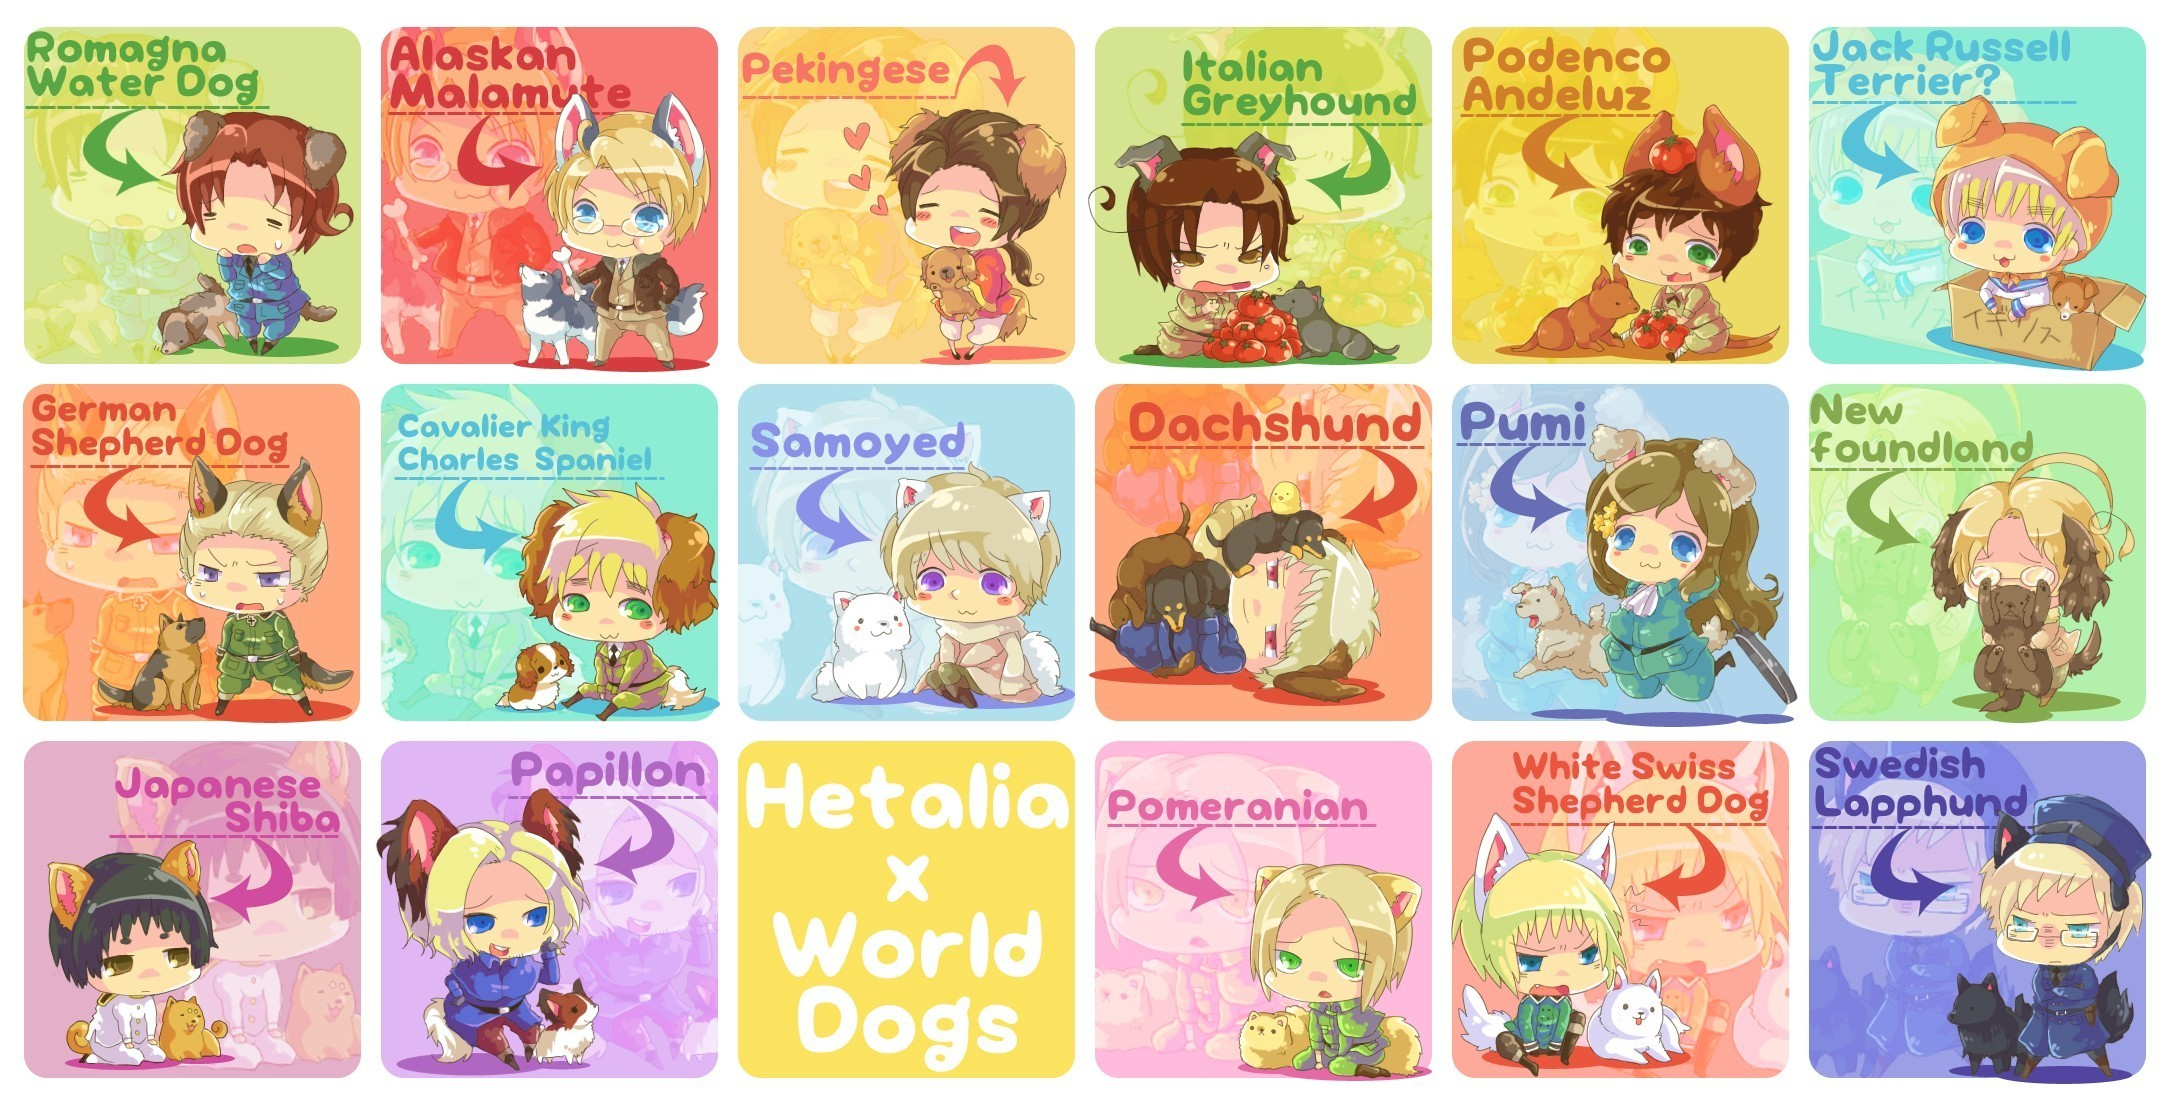 Hetalia Hetalia - World Dogs